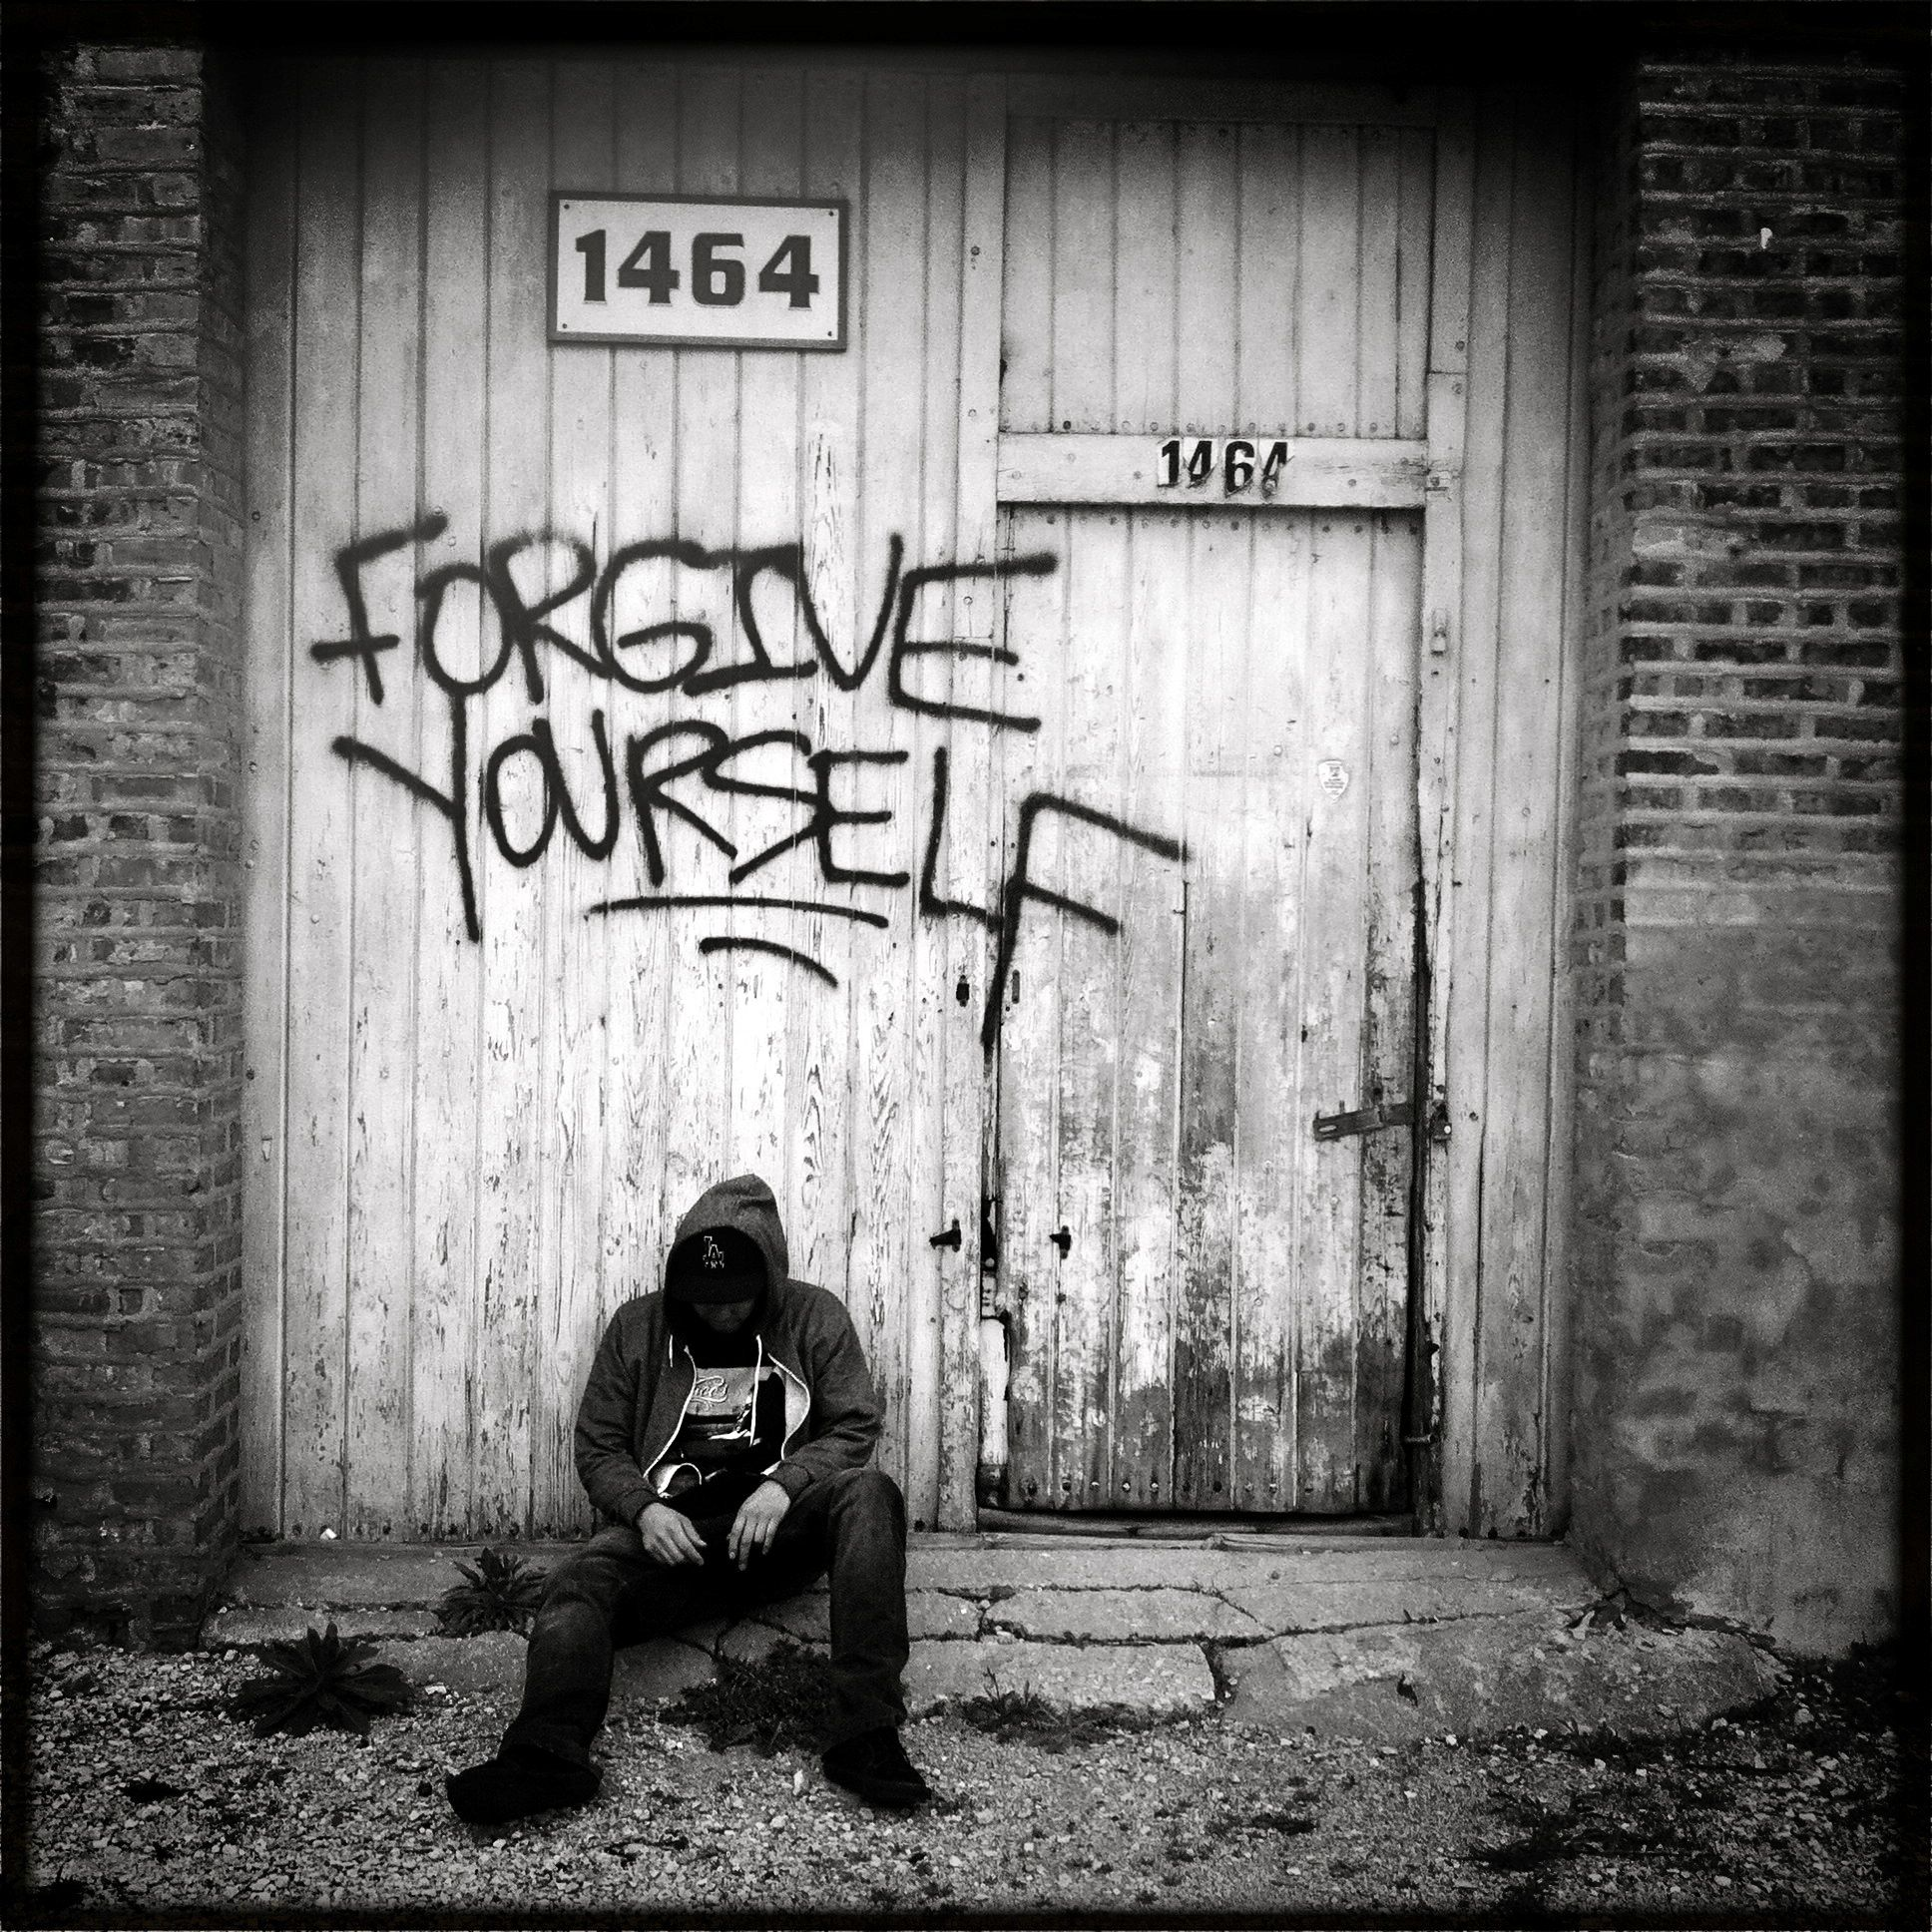 forgive yourself <3